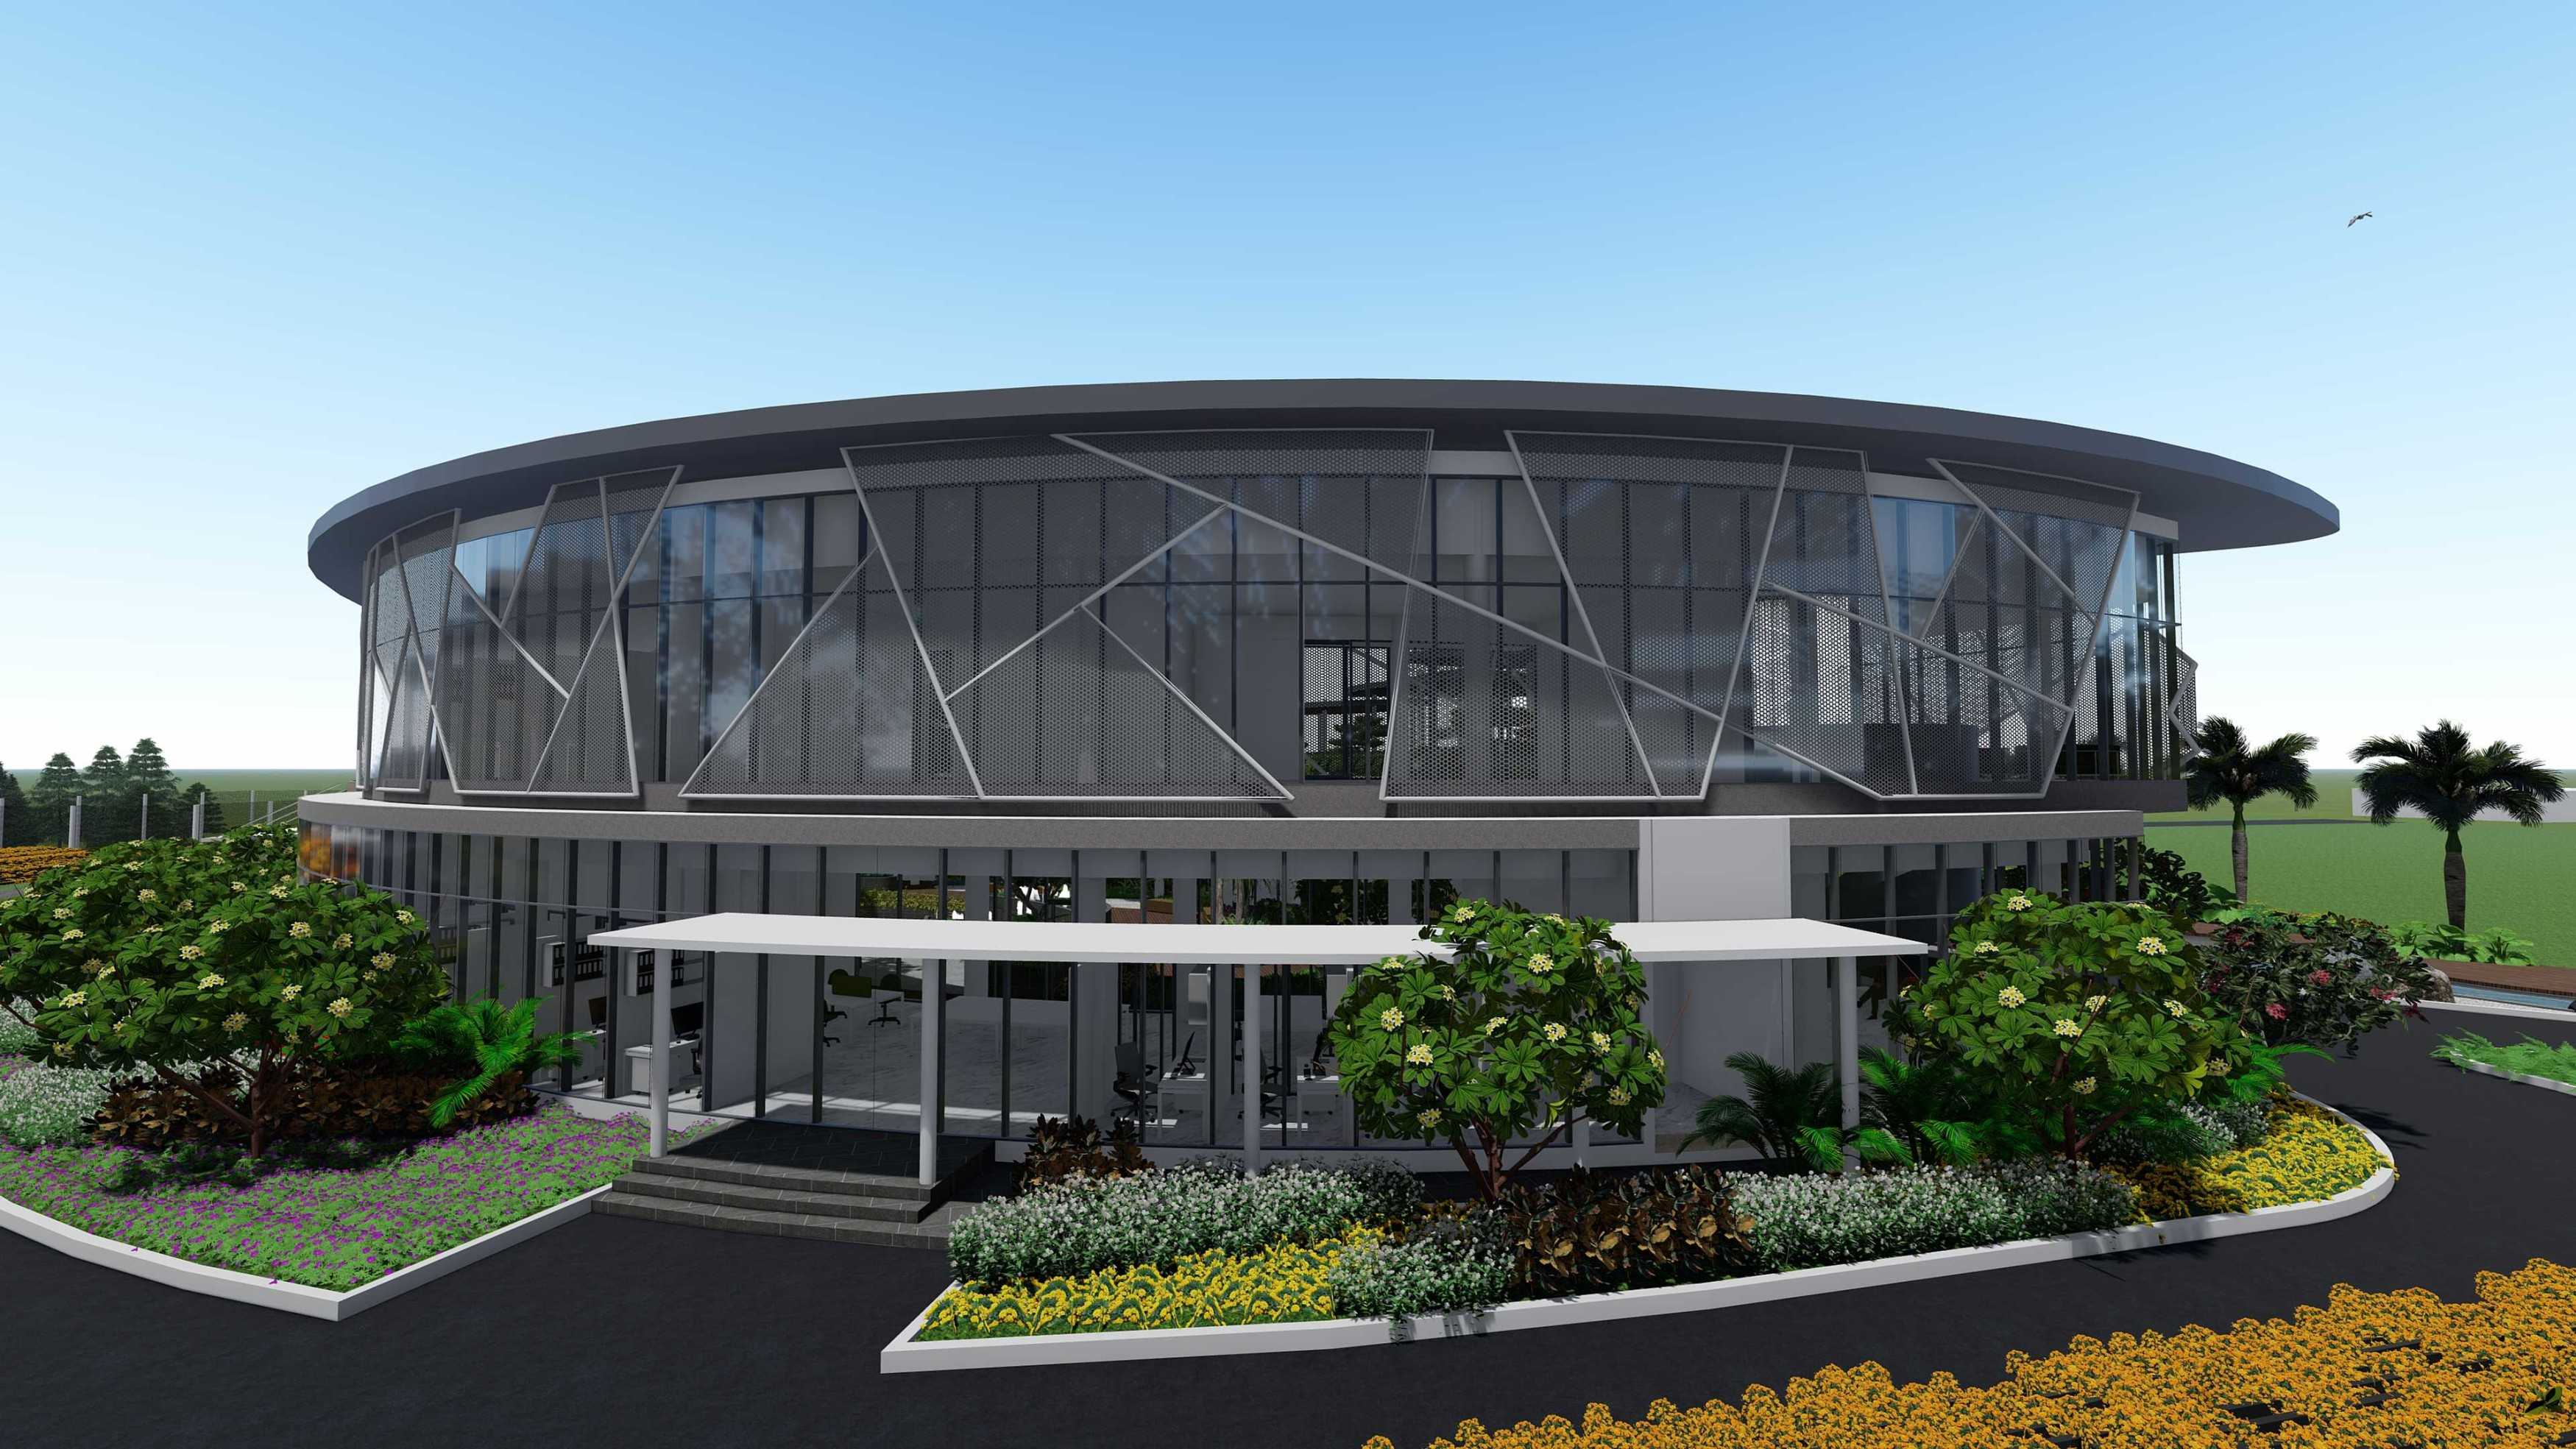 Raaj Gill Arsitek Aari Office Building & Laboratory #1 Pekanbaru, Kota Pekanbaru, Riau, Indonesia Pekanbaru, Kota Pekanbaru, Riau, Indonesia Raaj-Gill-Arsitek-Aari-Office-Building-Laboratory   74659